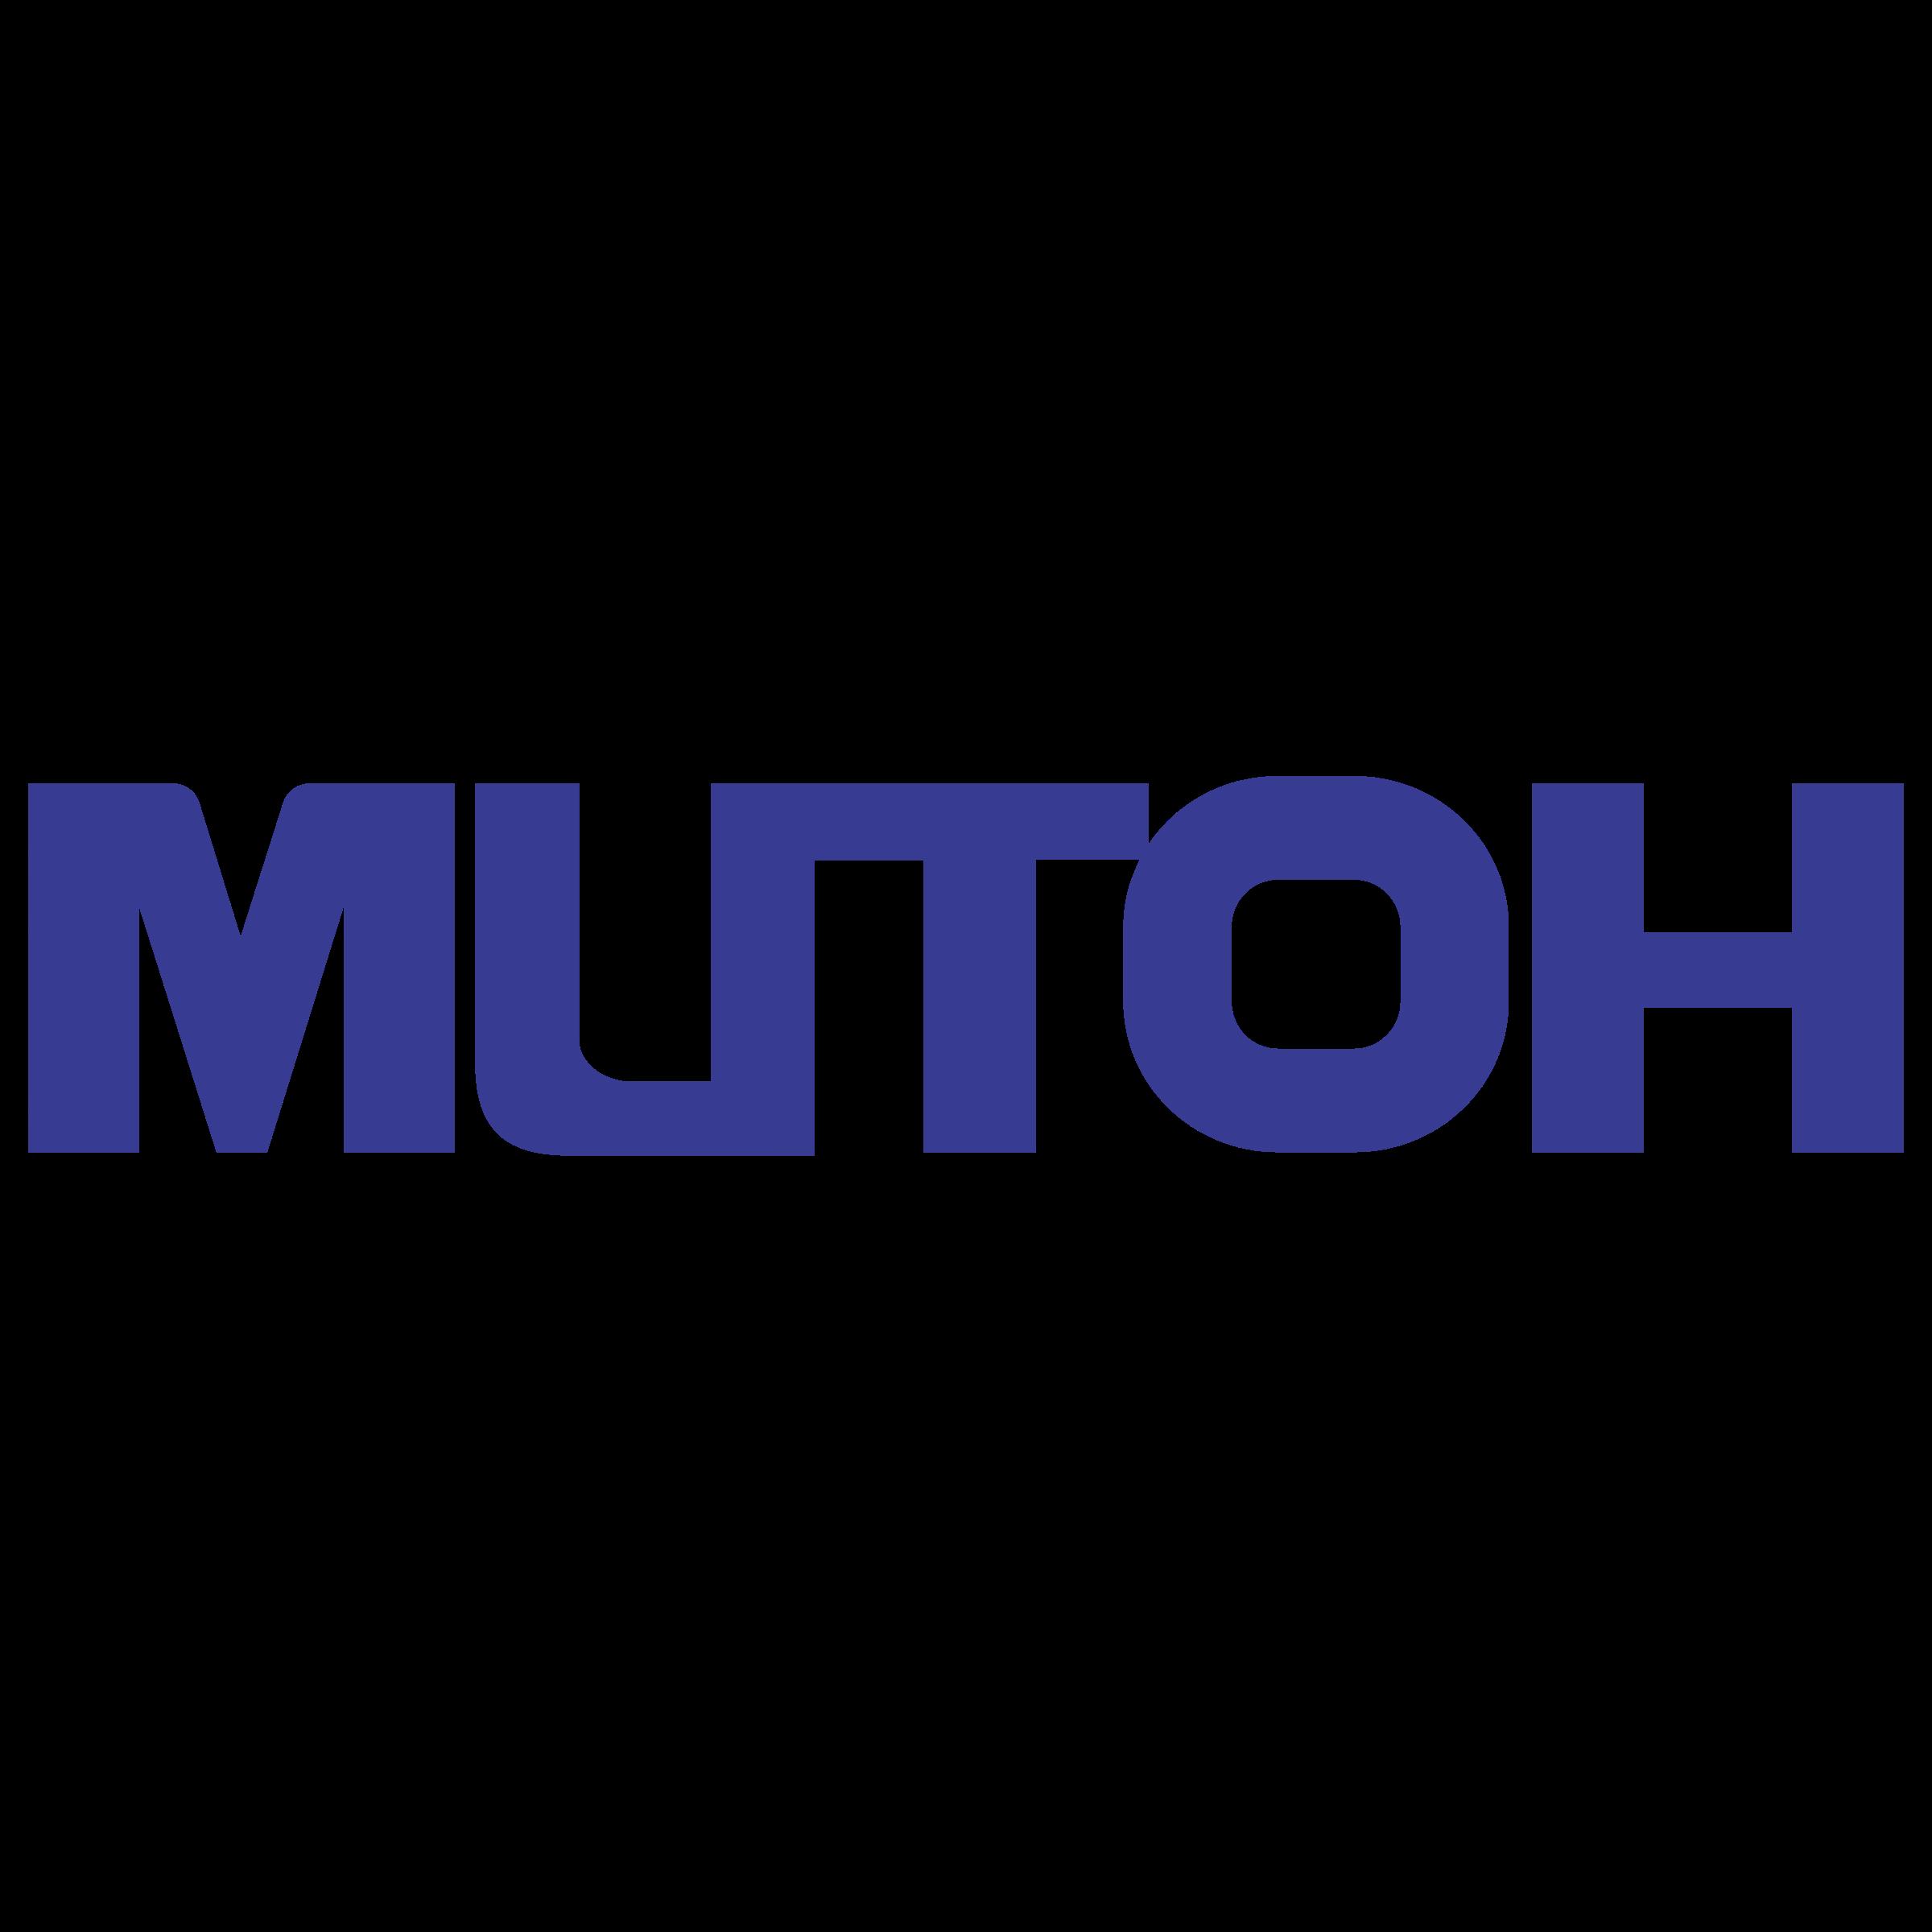 mutoh-logo-png-transparent